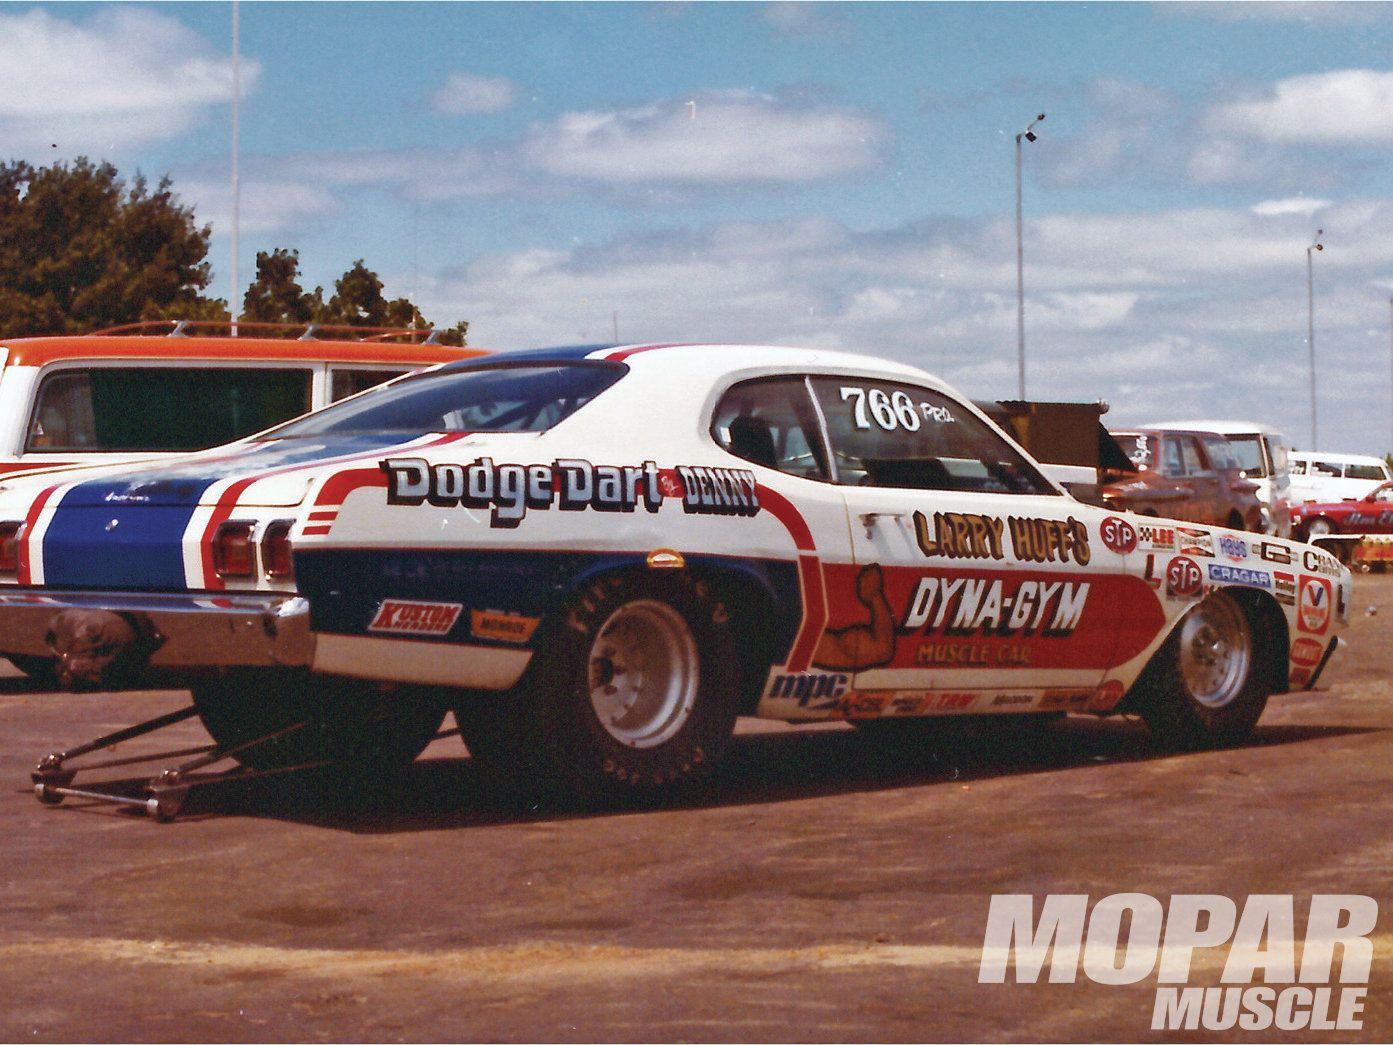 Pro Stock Drag Racing Drag Racing Pro Stock 1970 Related Keywords Suggestions Drag Drag Racing Cars Nhra Pro Stock Drag Cars